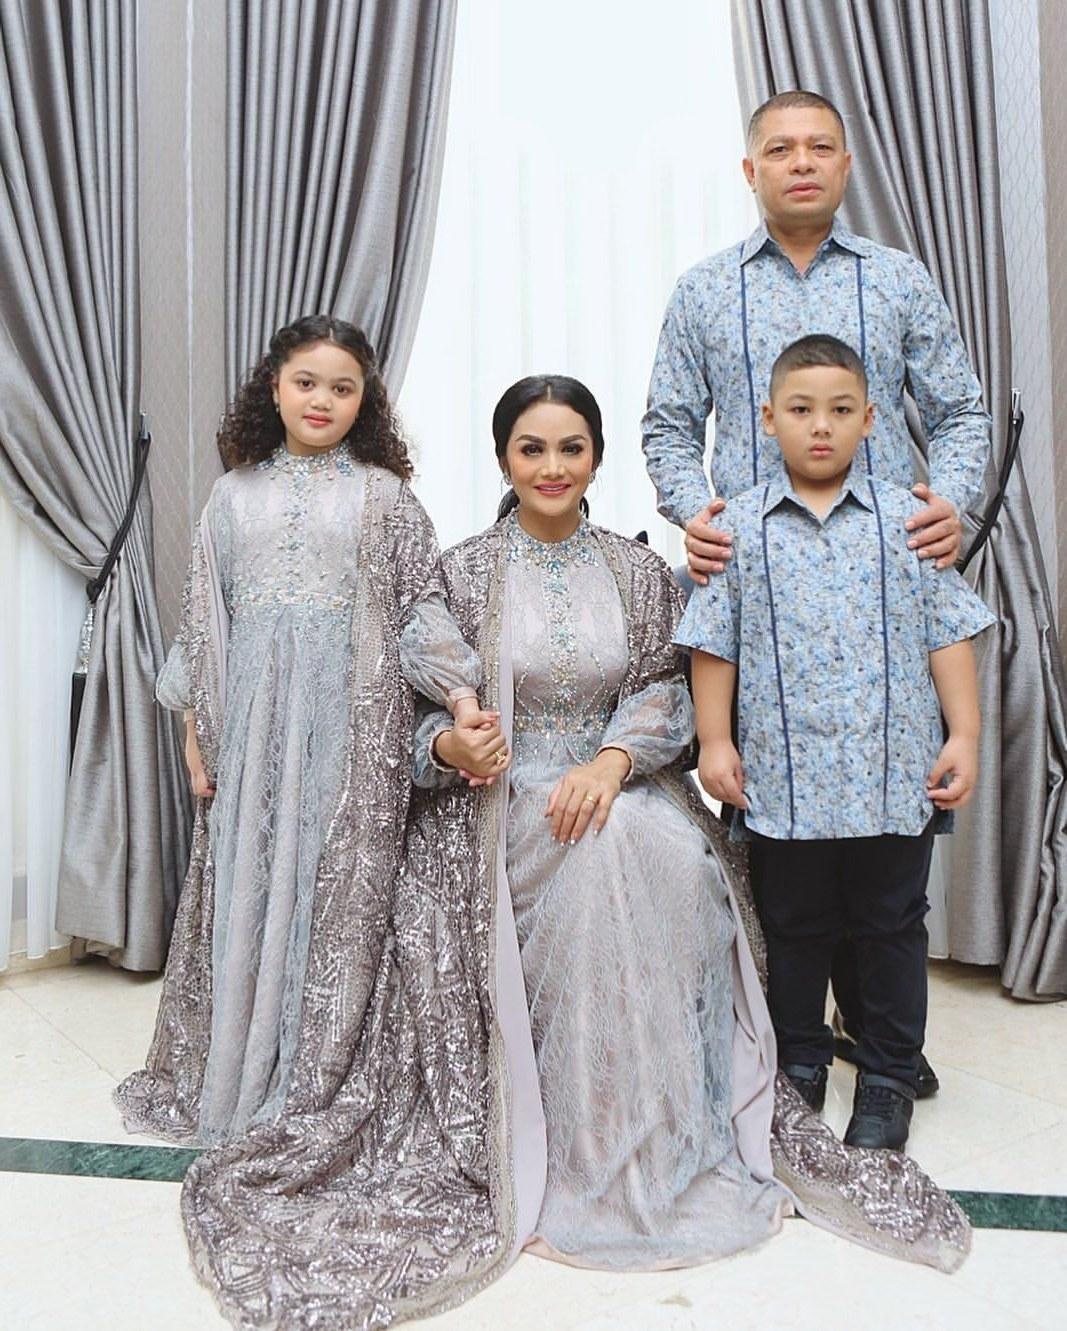 Bentuk Model Baju Lebaran Keluarga Artis Zwd9 Tema Baju Lebaran Keluarga Para Artis Yang Menarik Siapa